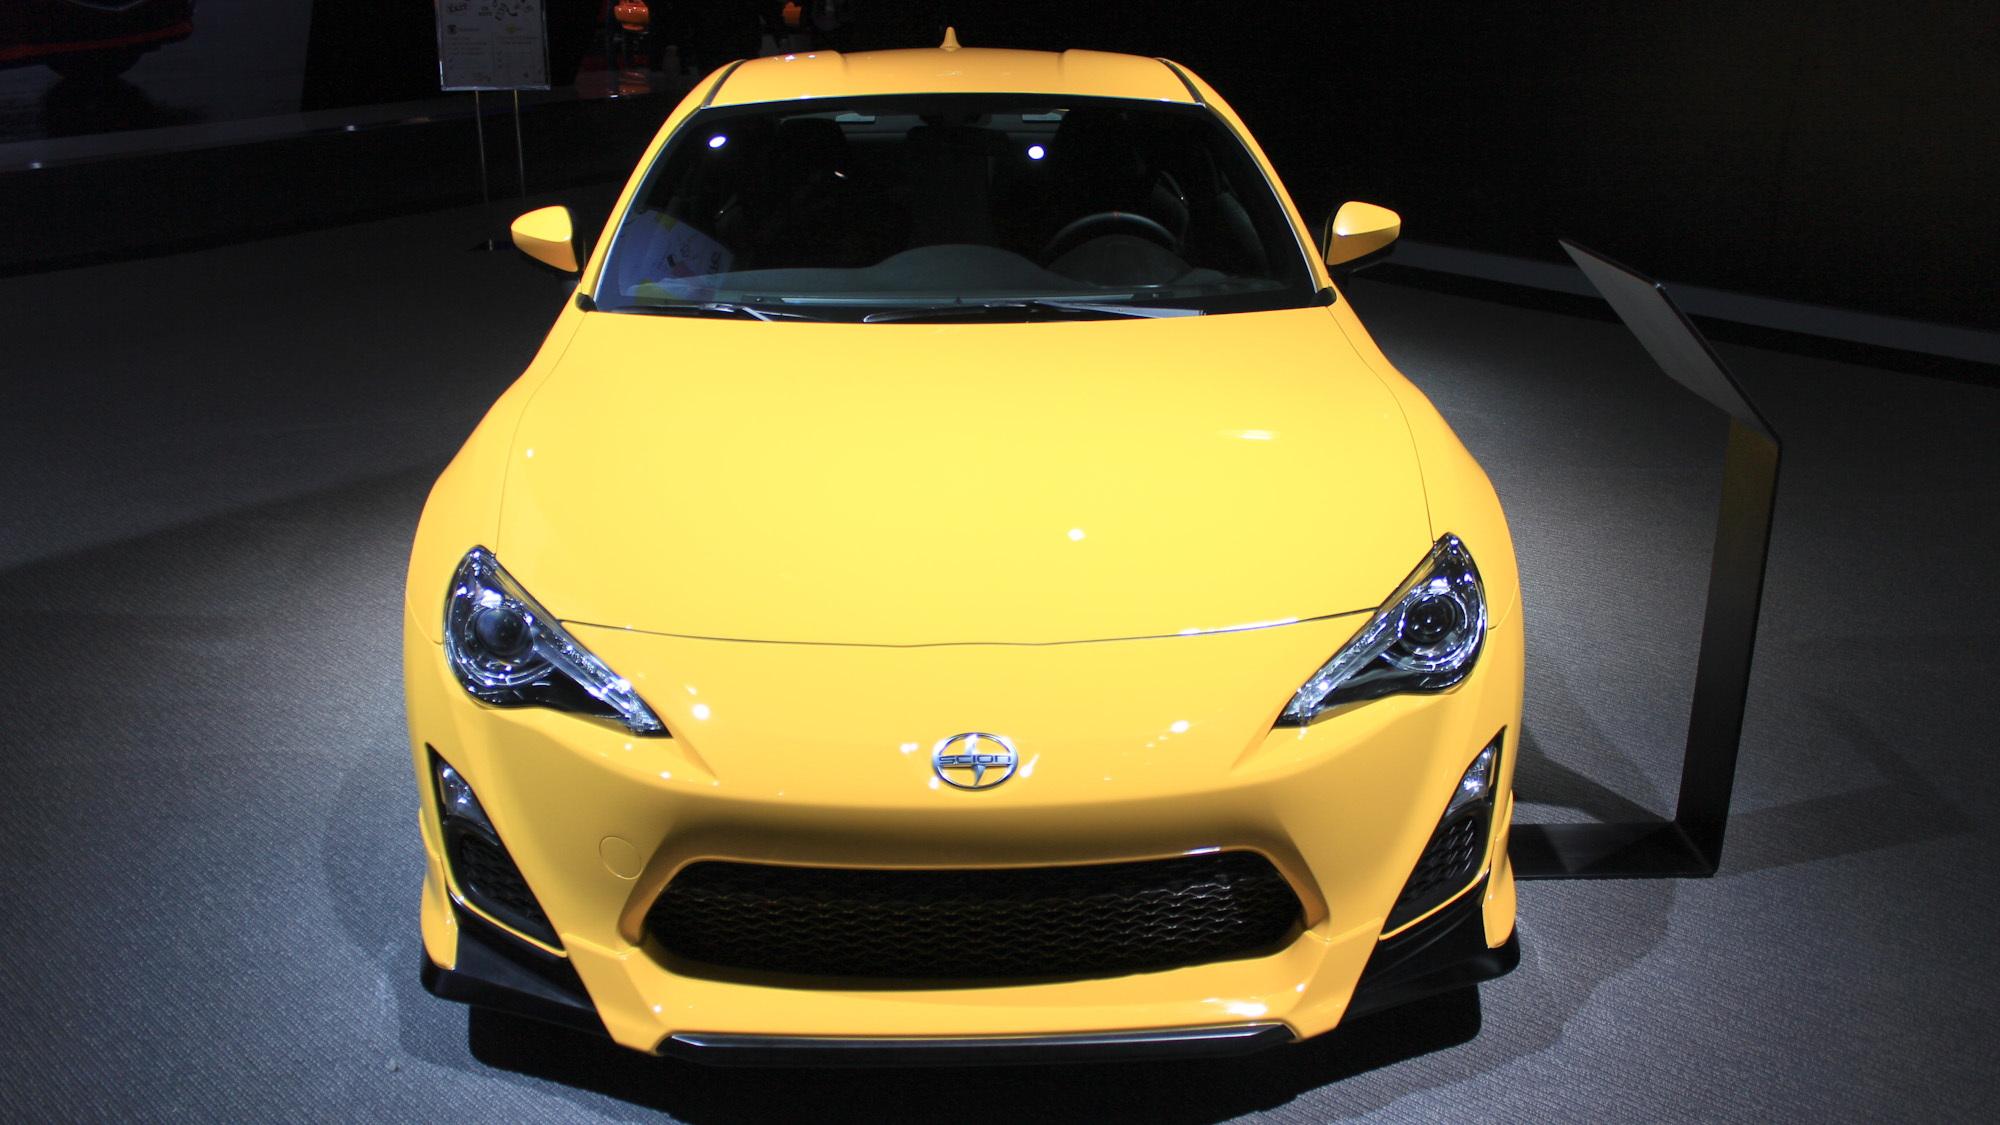 2014 Scion FR-S Release Series 1.0, 2014 New York Auto Show